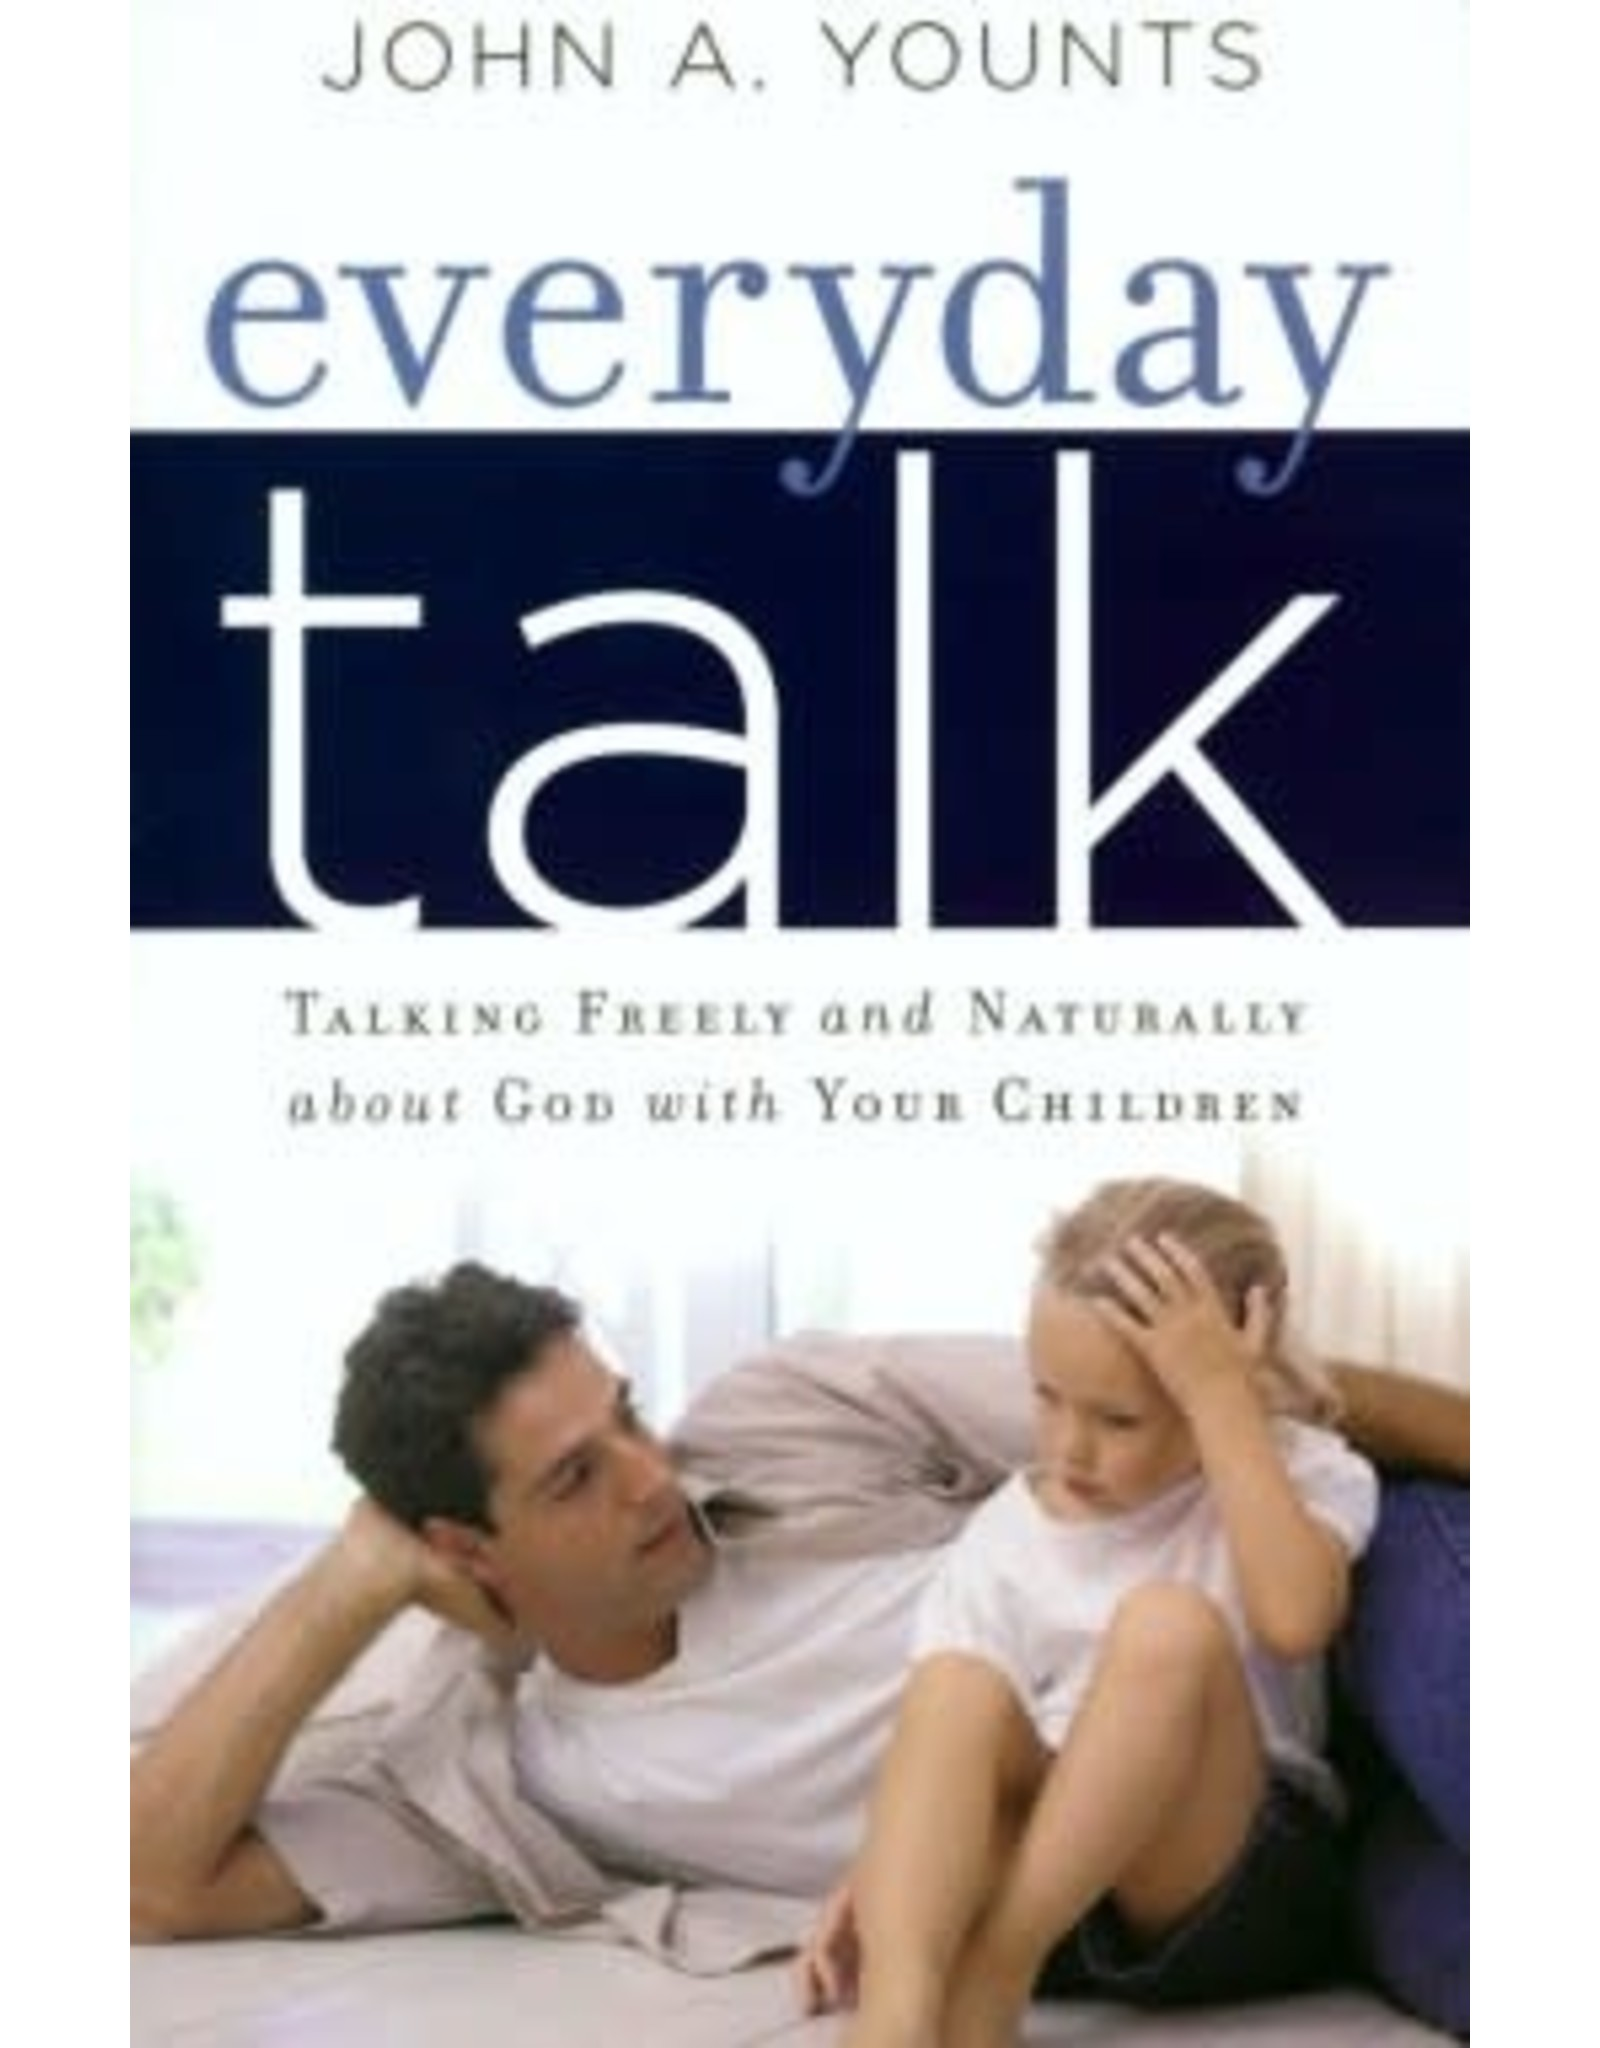 Younts Everyday Talk